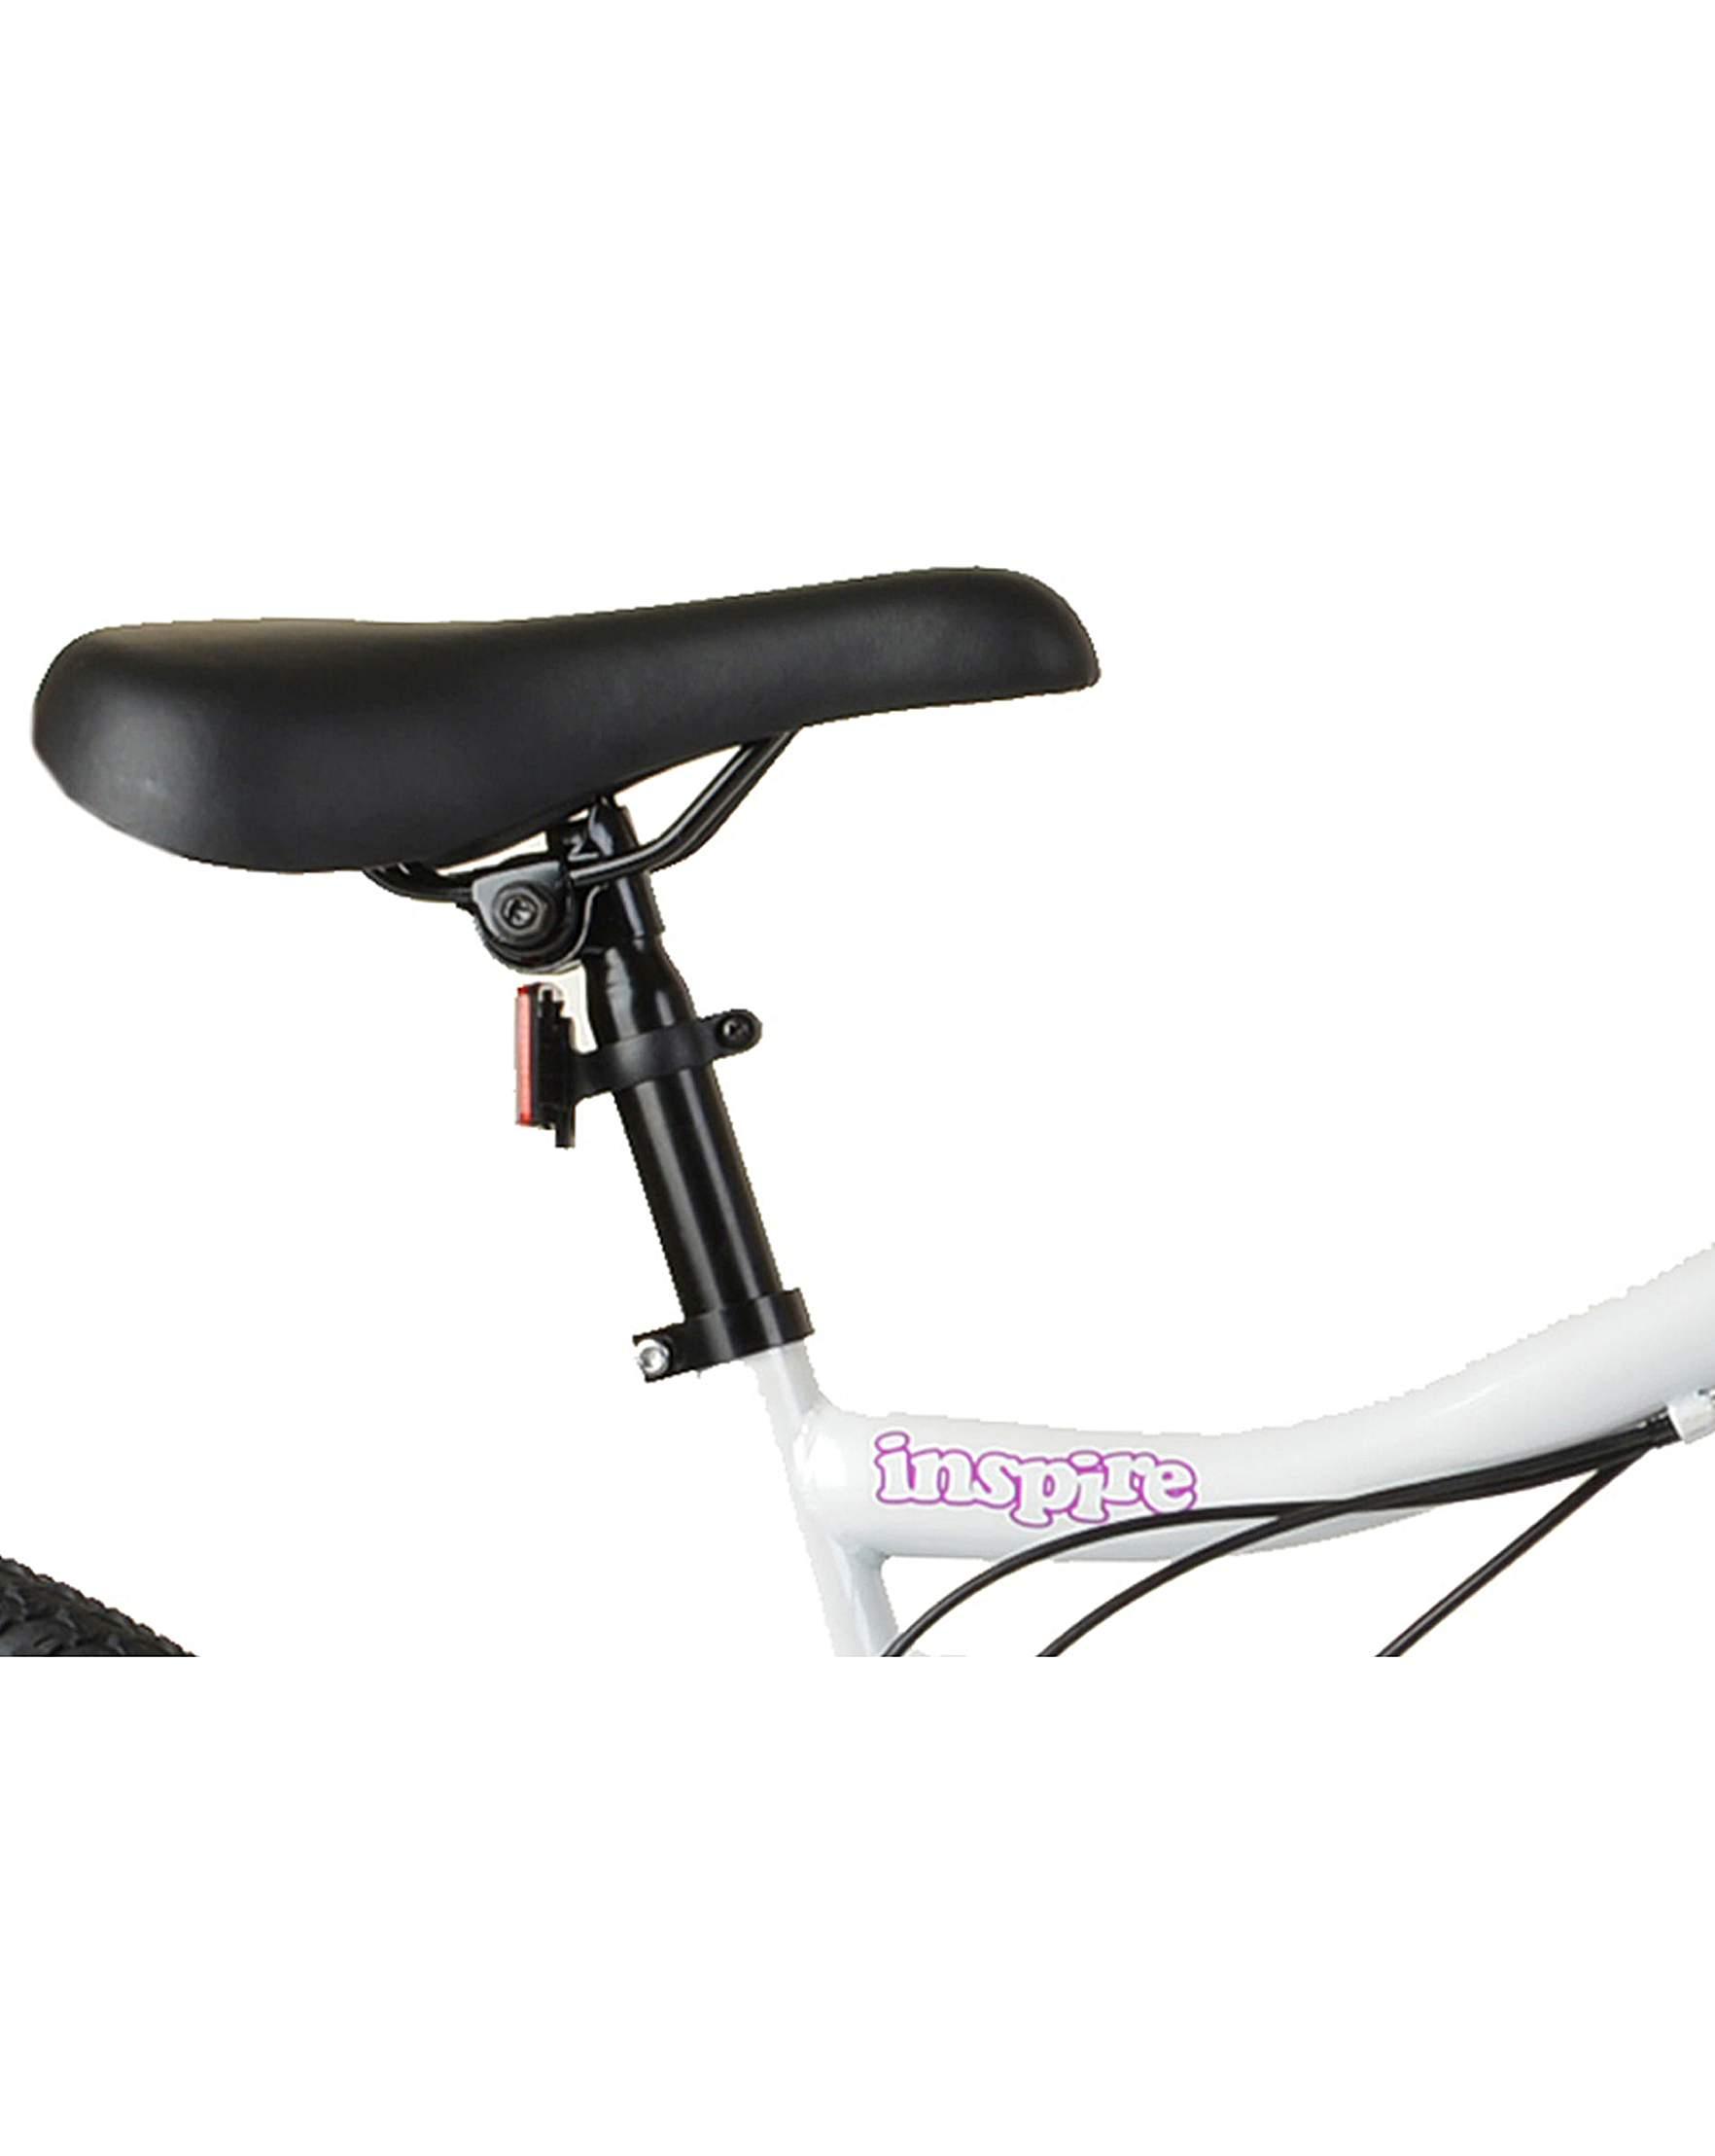 71637c5a2d3 Muddyfox Inspire 26 Ladies Mountain Bike